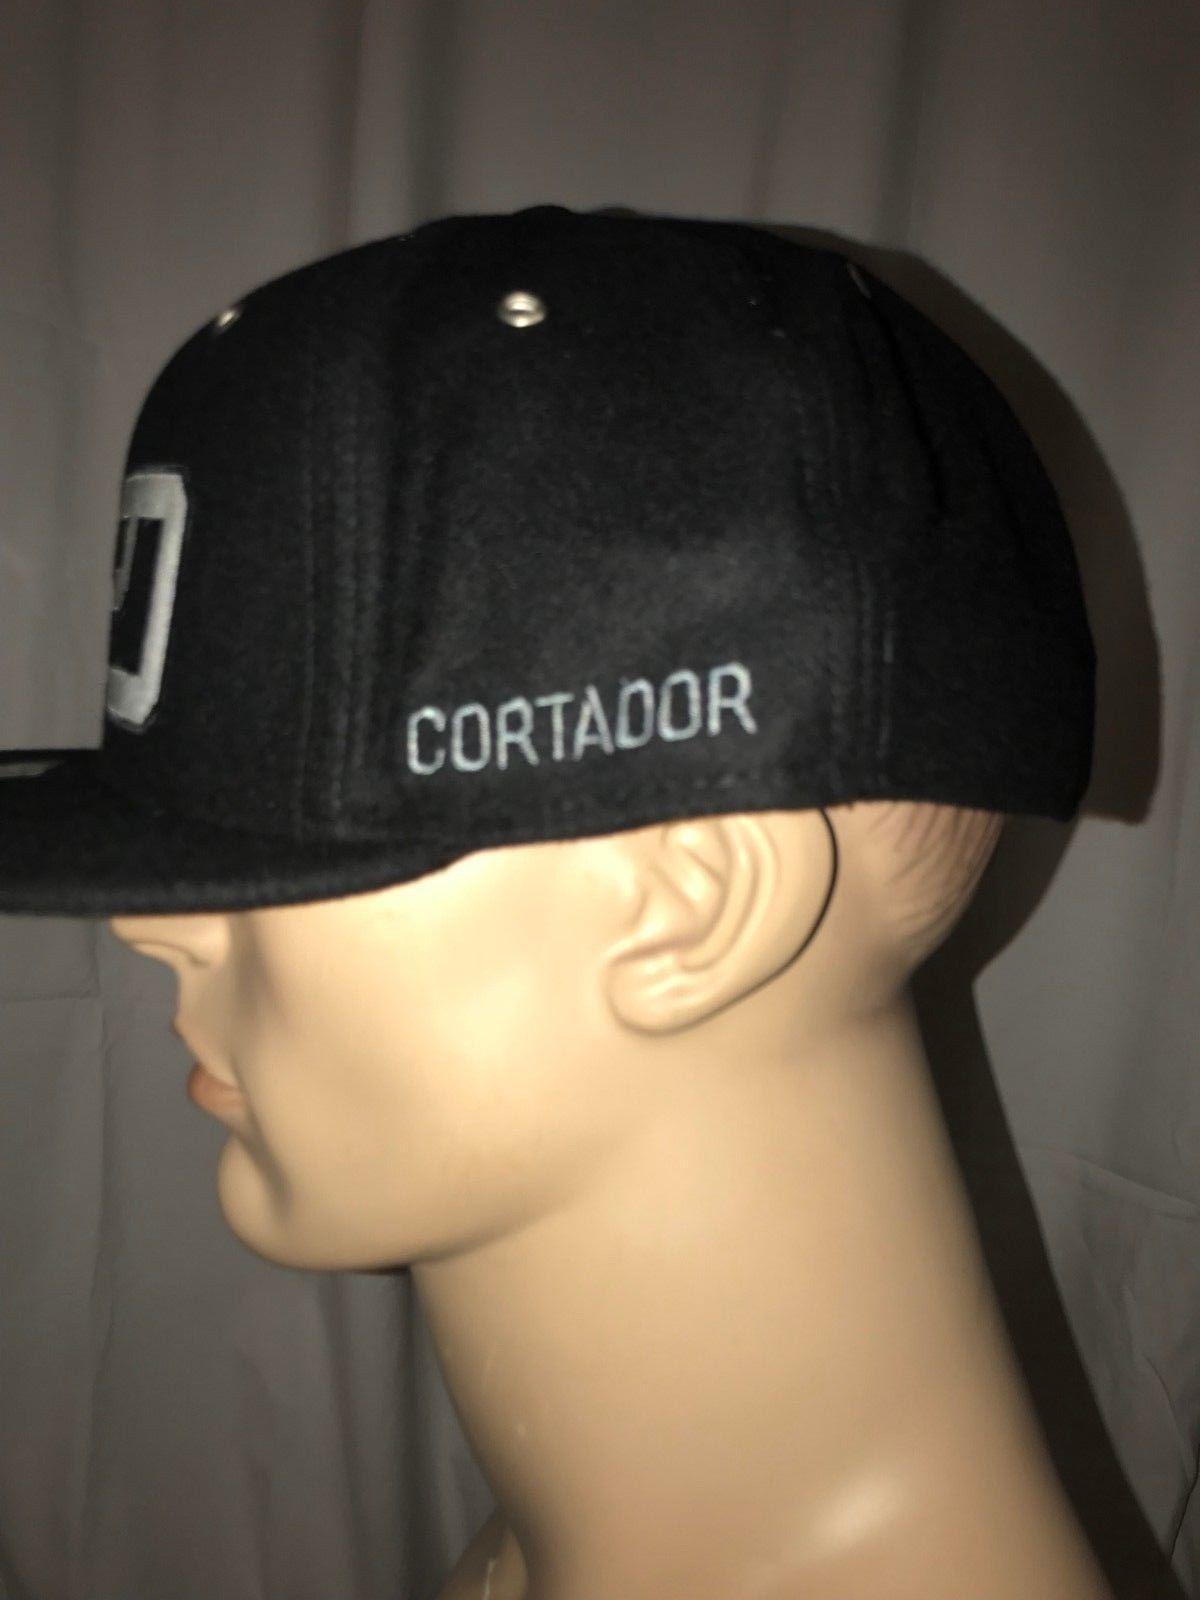 Nike M42O Mariano Rivera Retirement Hat Cap Cortador Mo Limited Edition